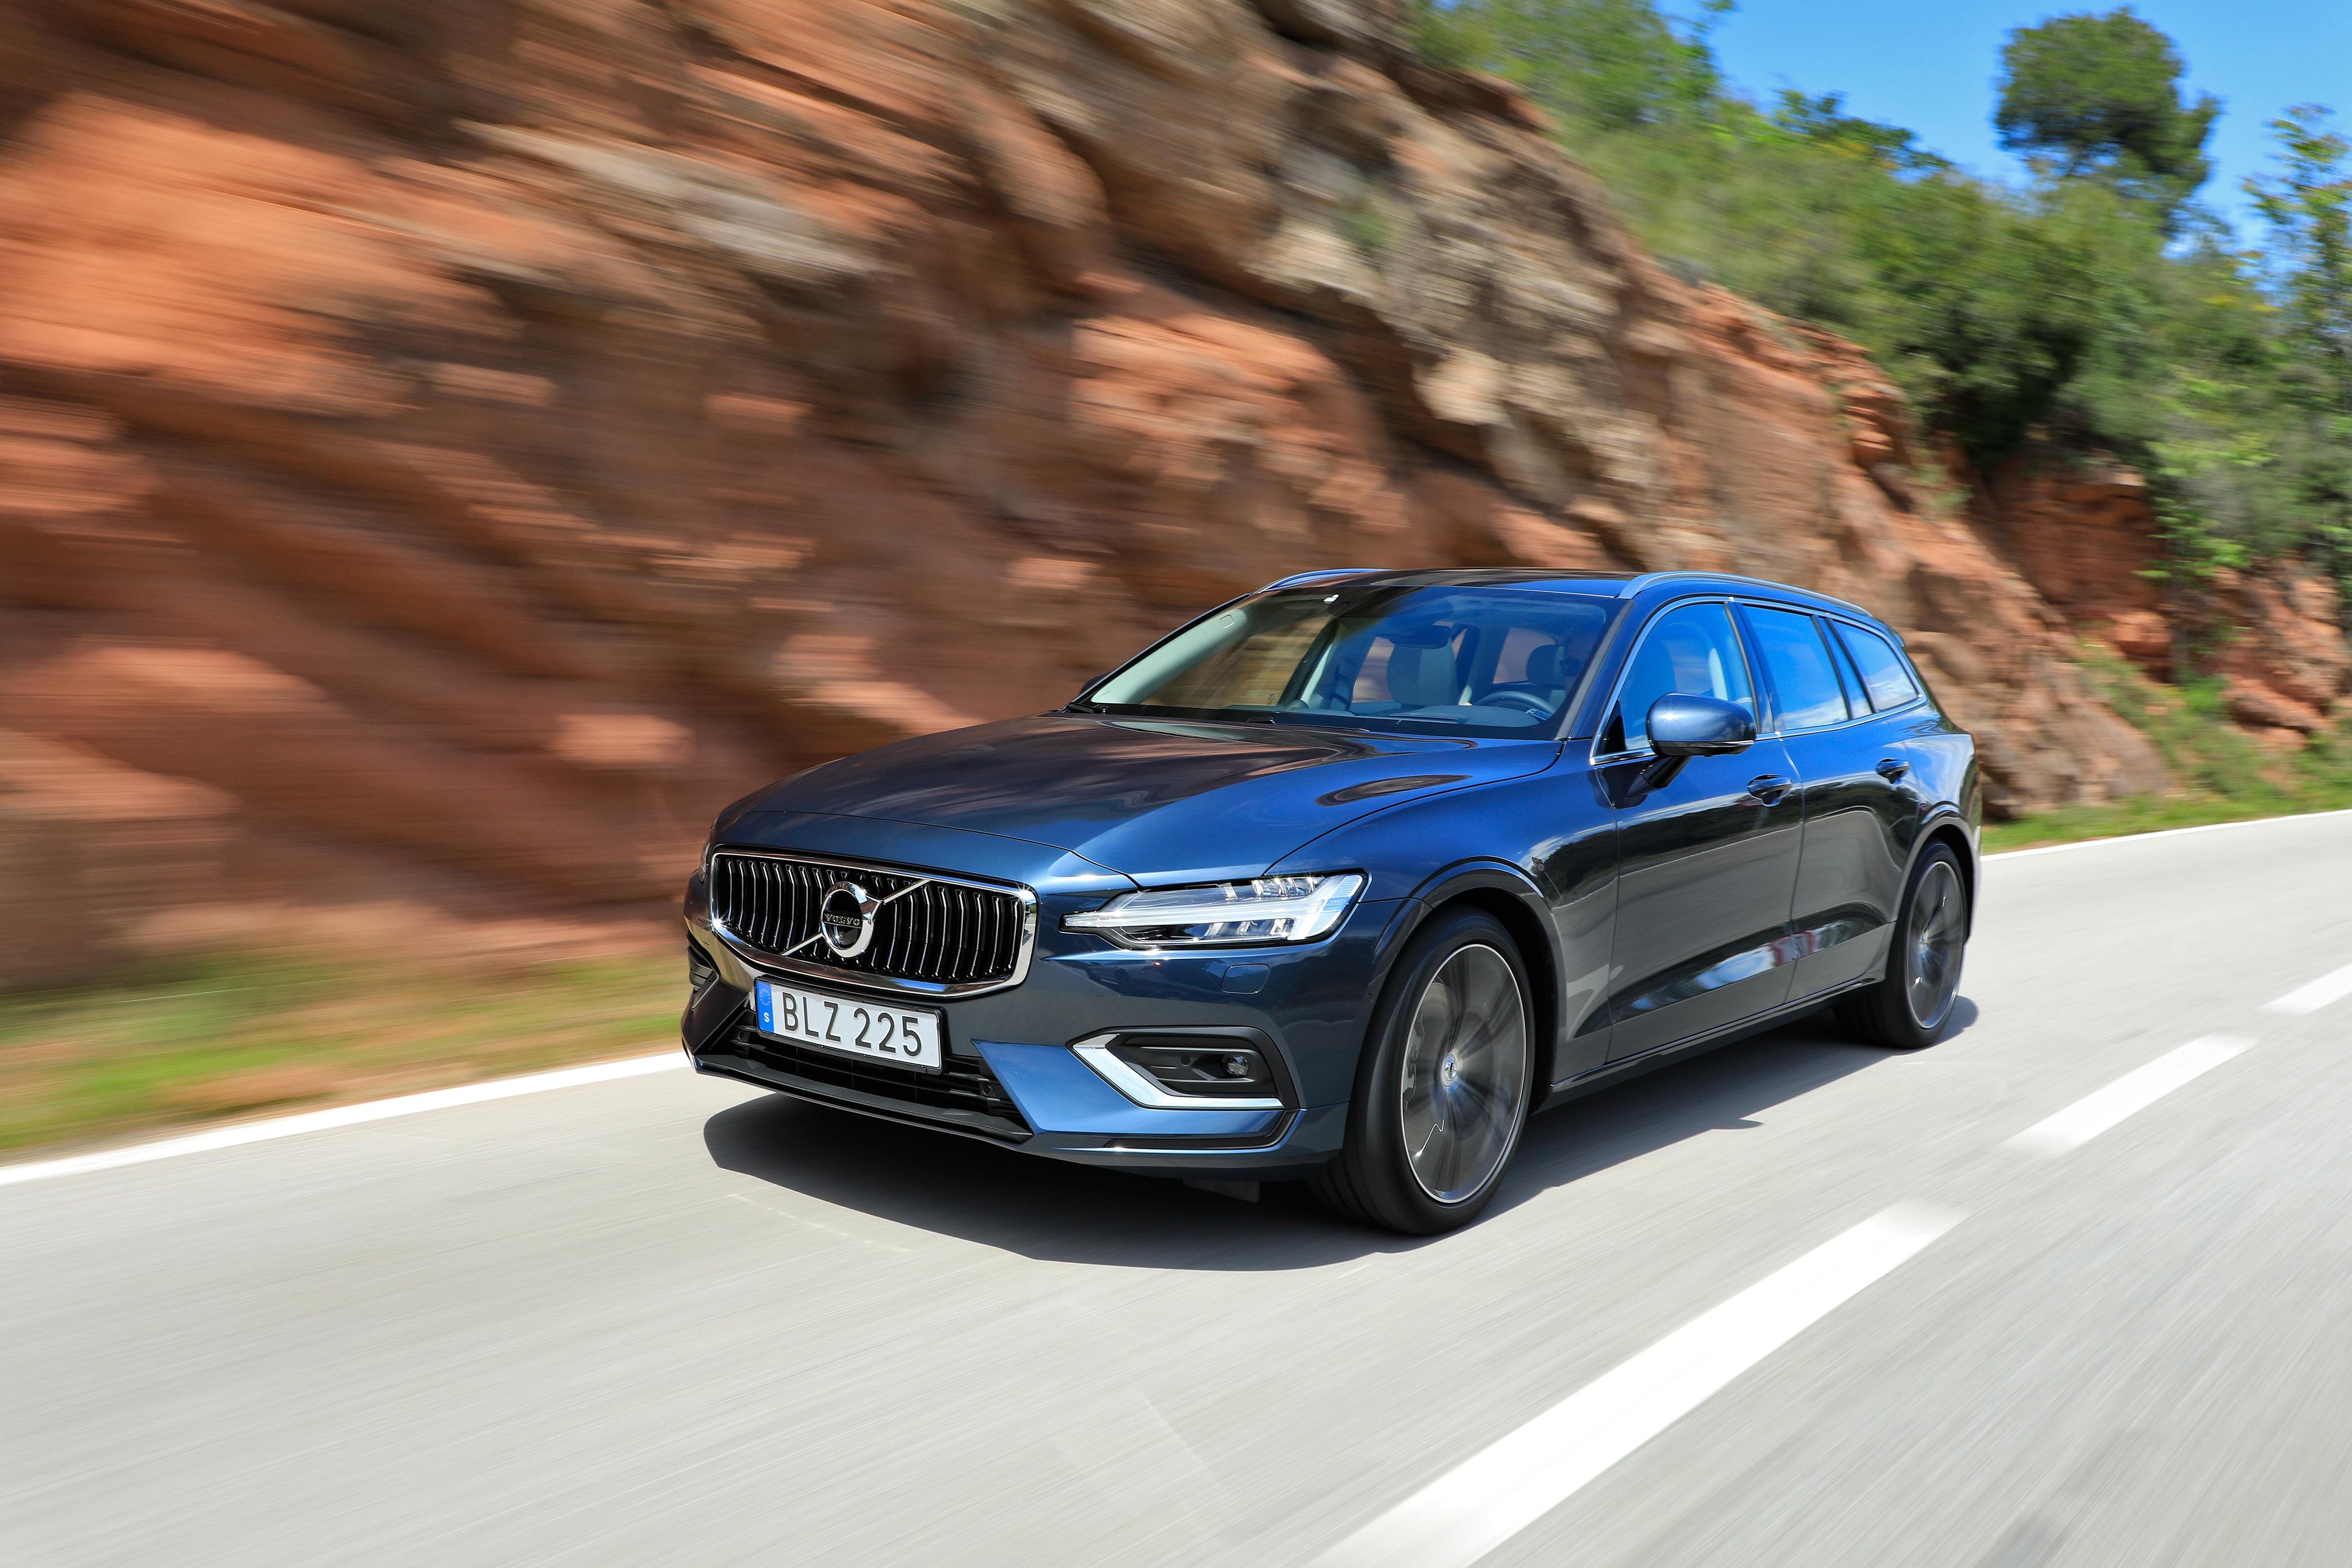 First Test 2019 Volvo V60 D4 Inscription - Drive-My Blogs - Drive